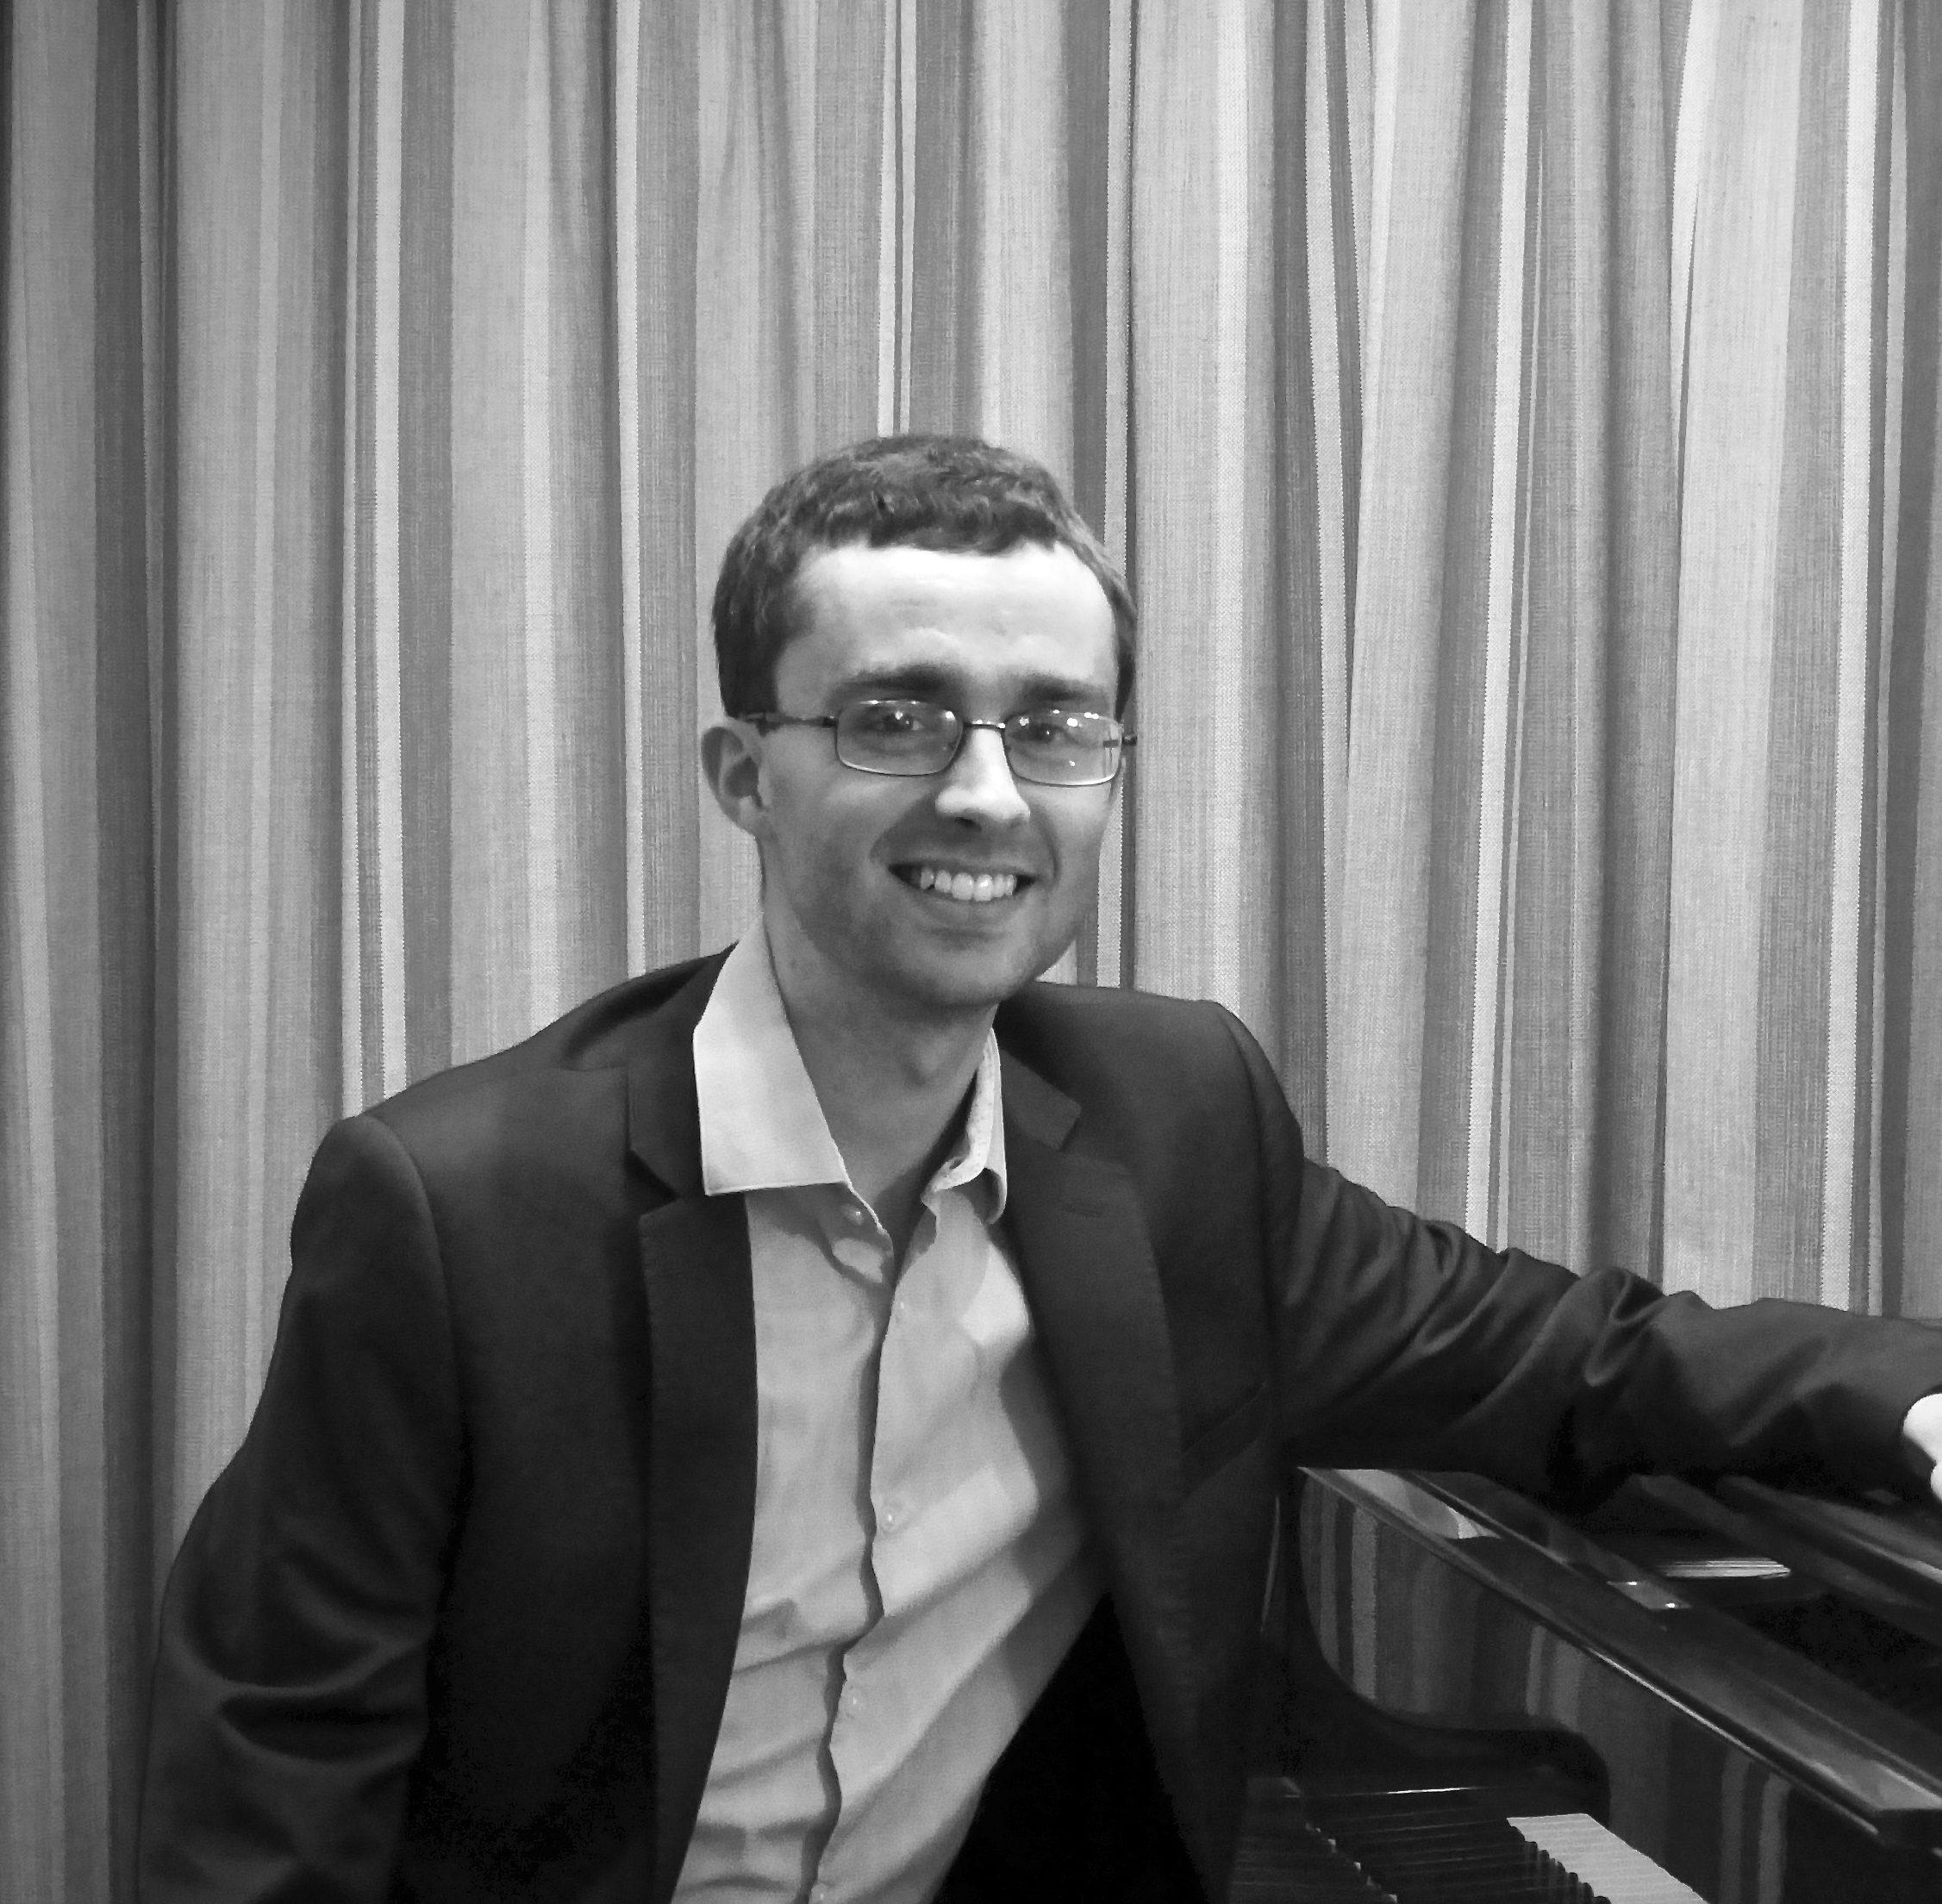 Pianist | Ed